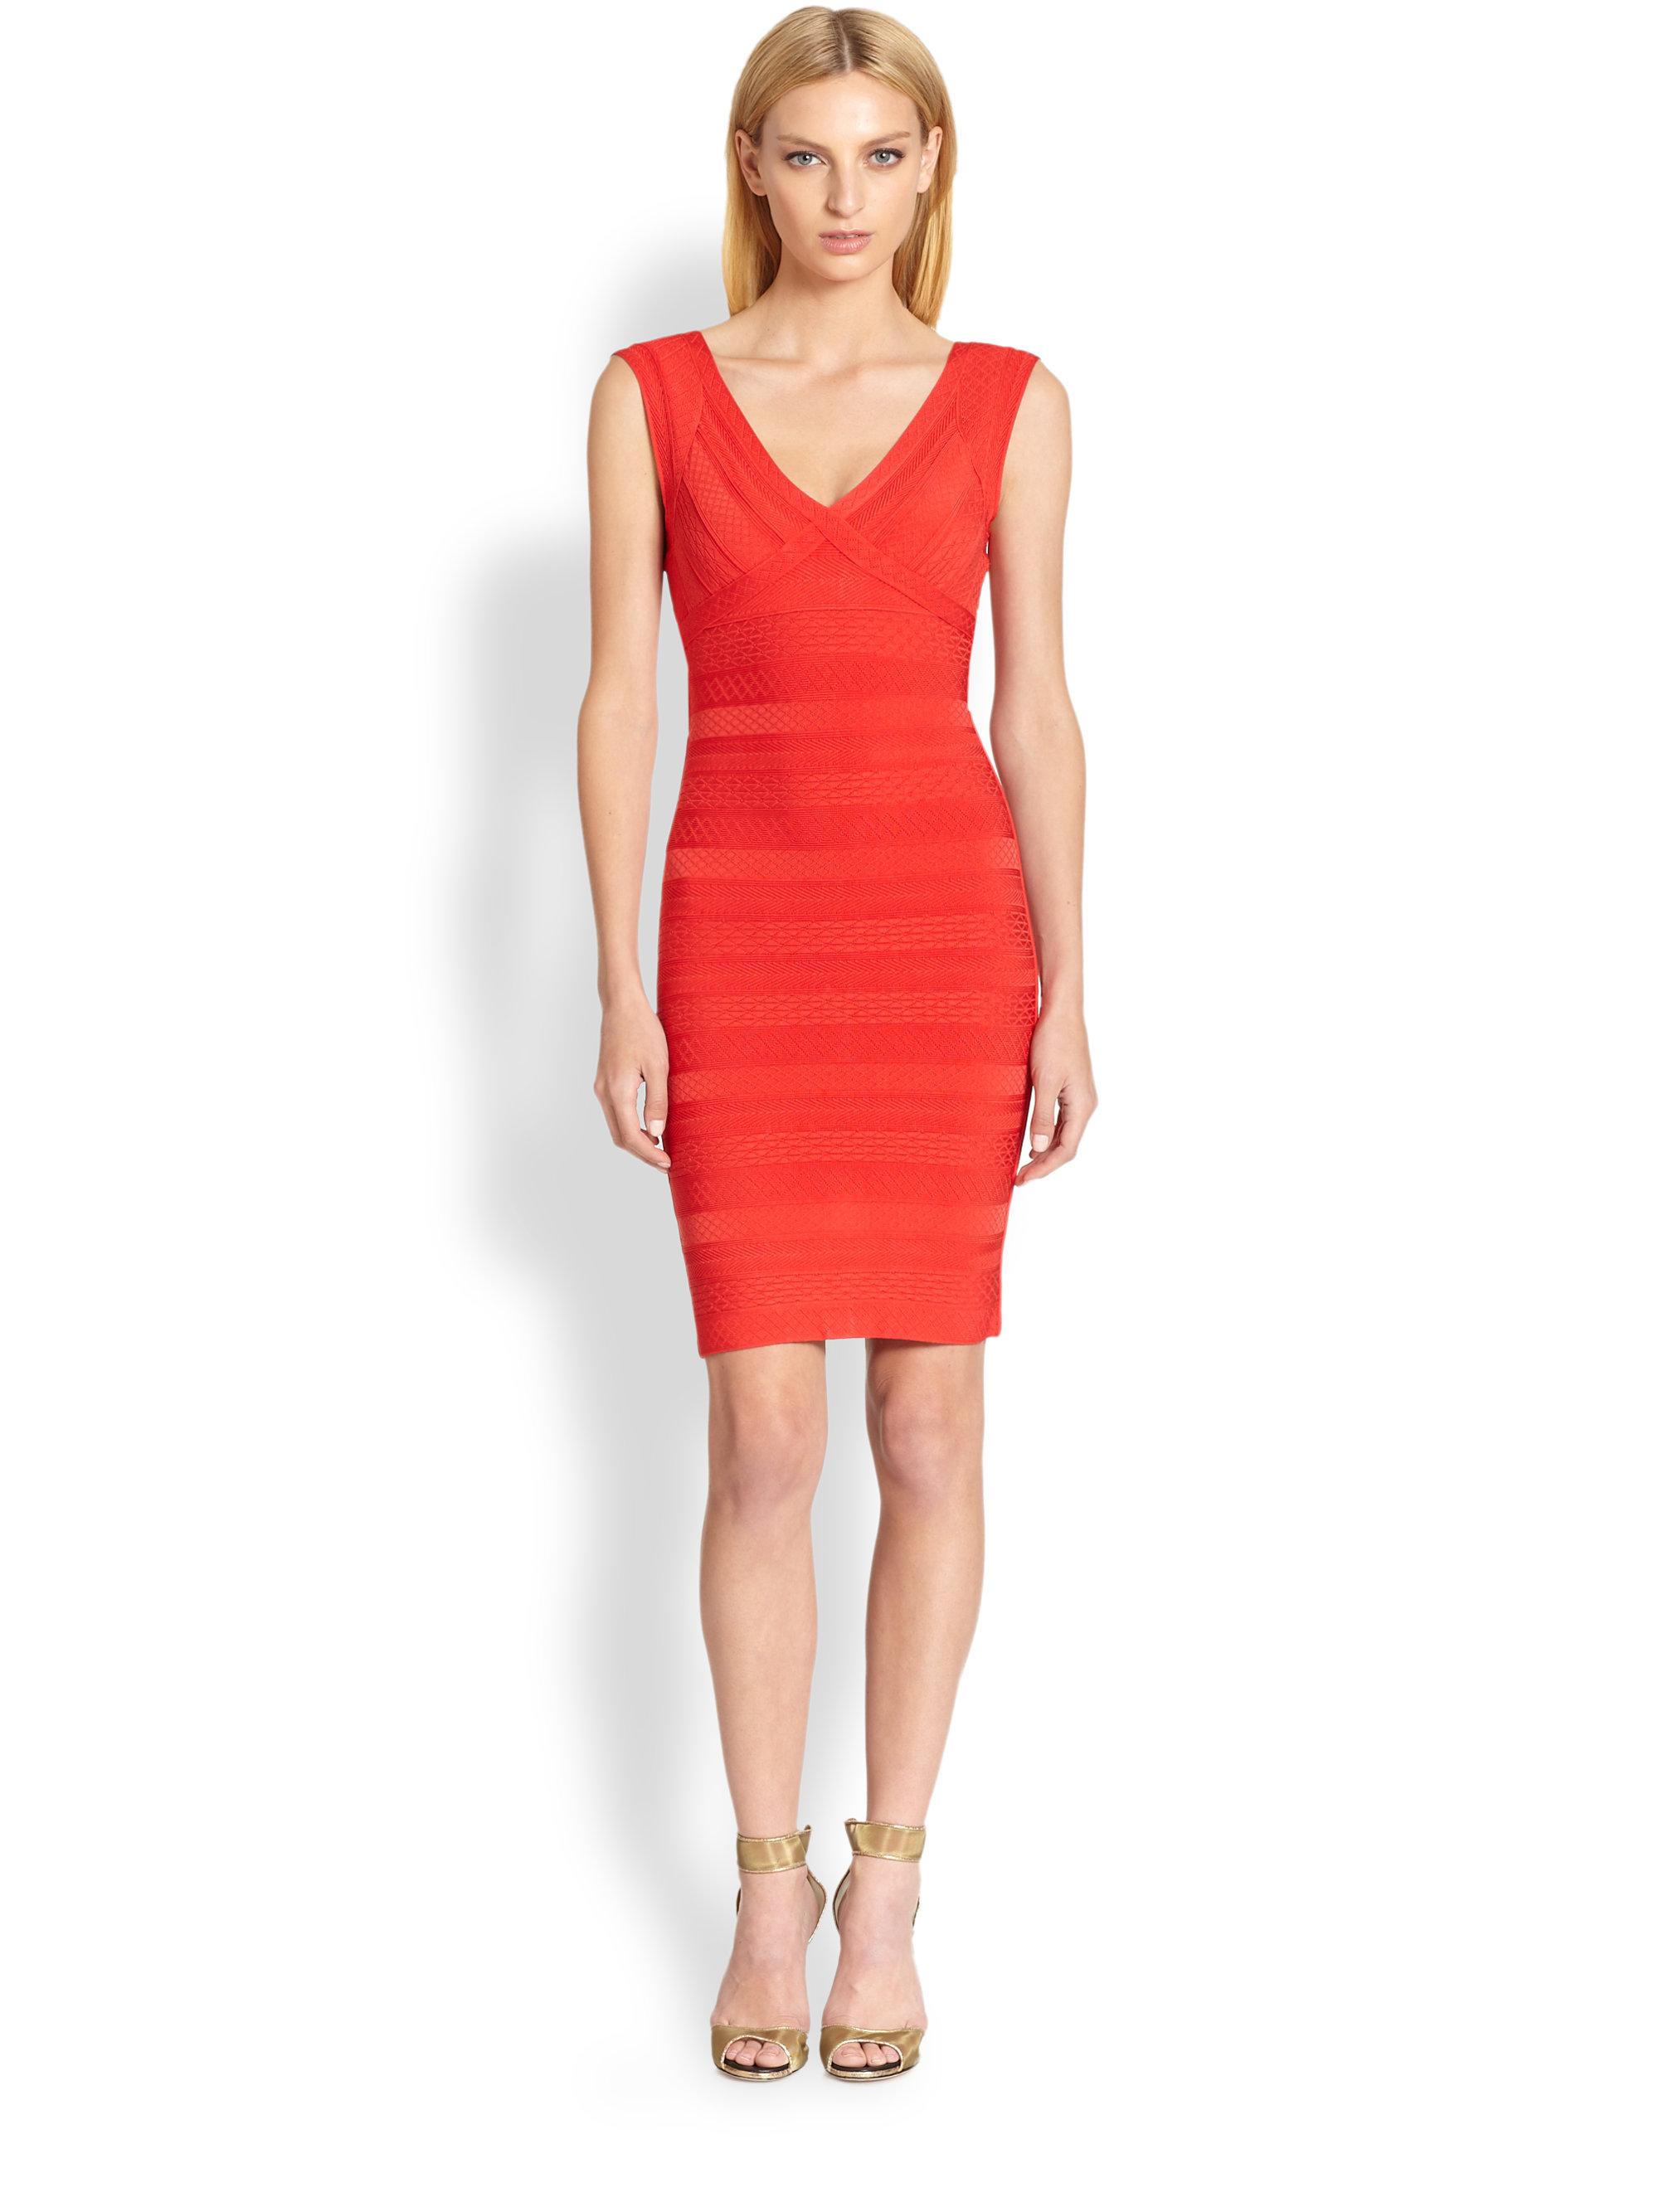 Galerry sheath dress coral